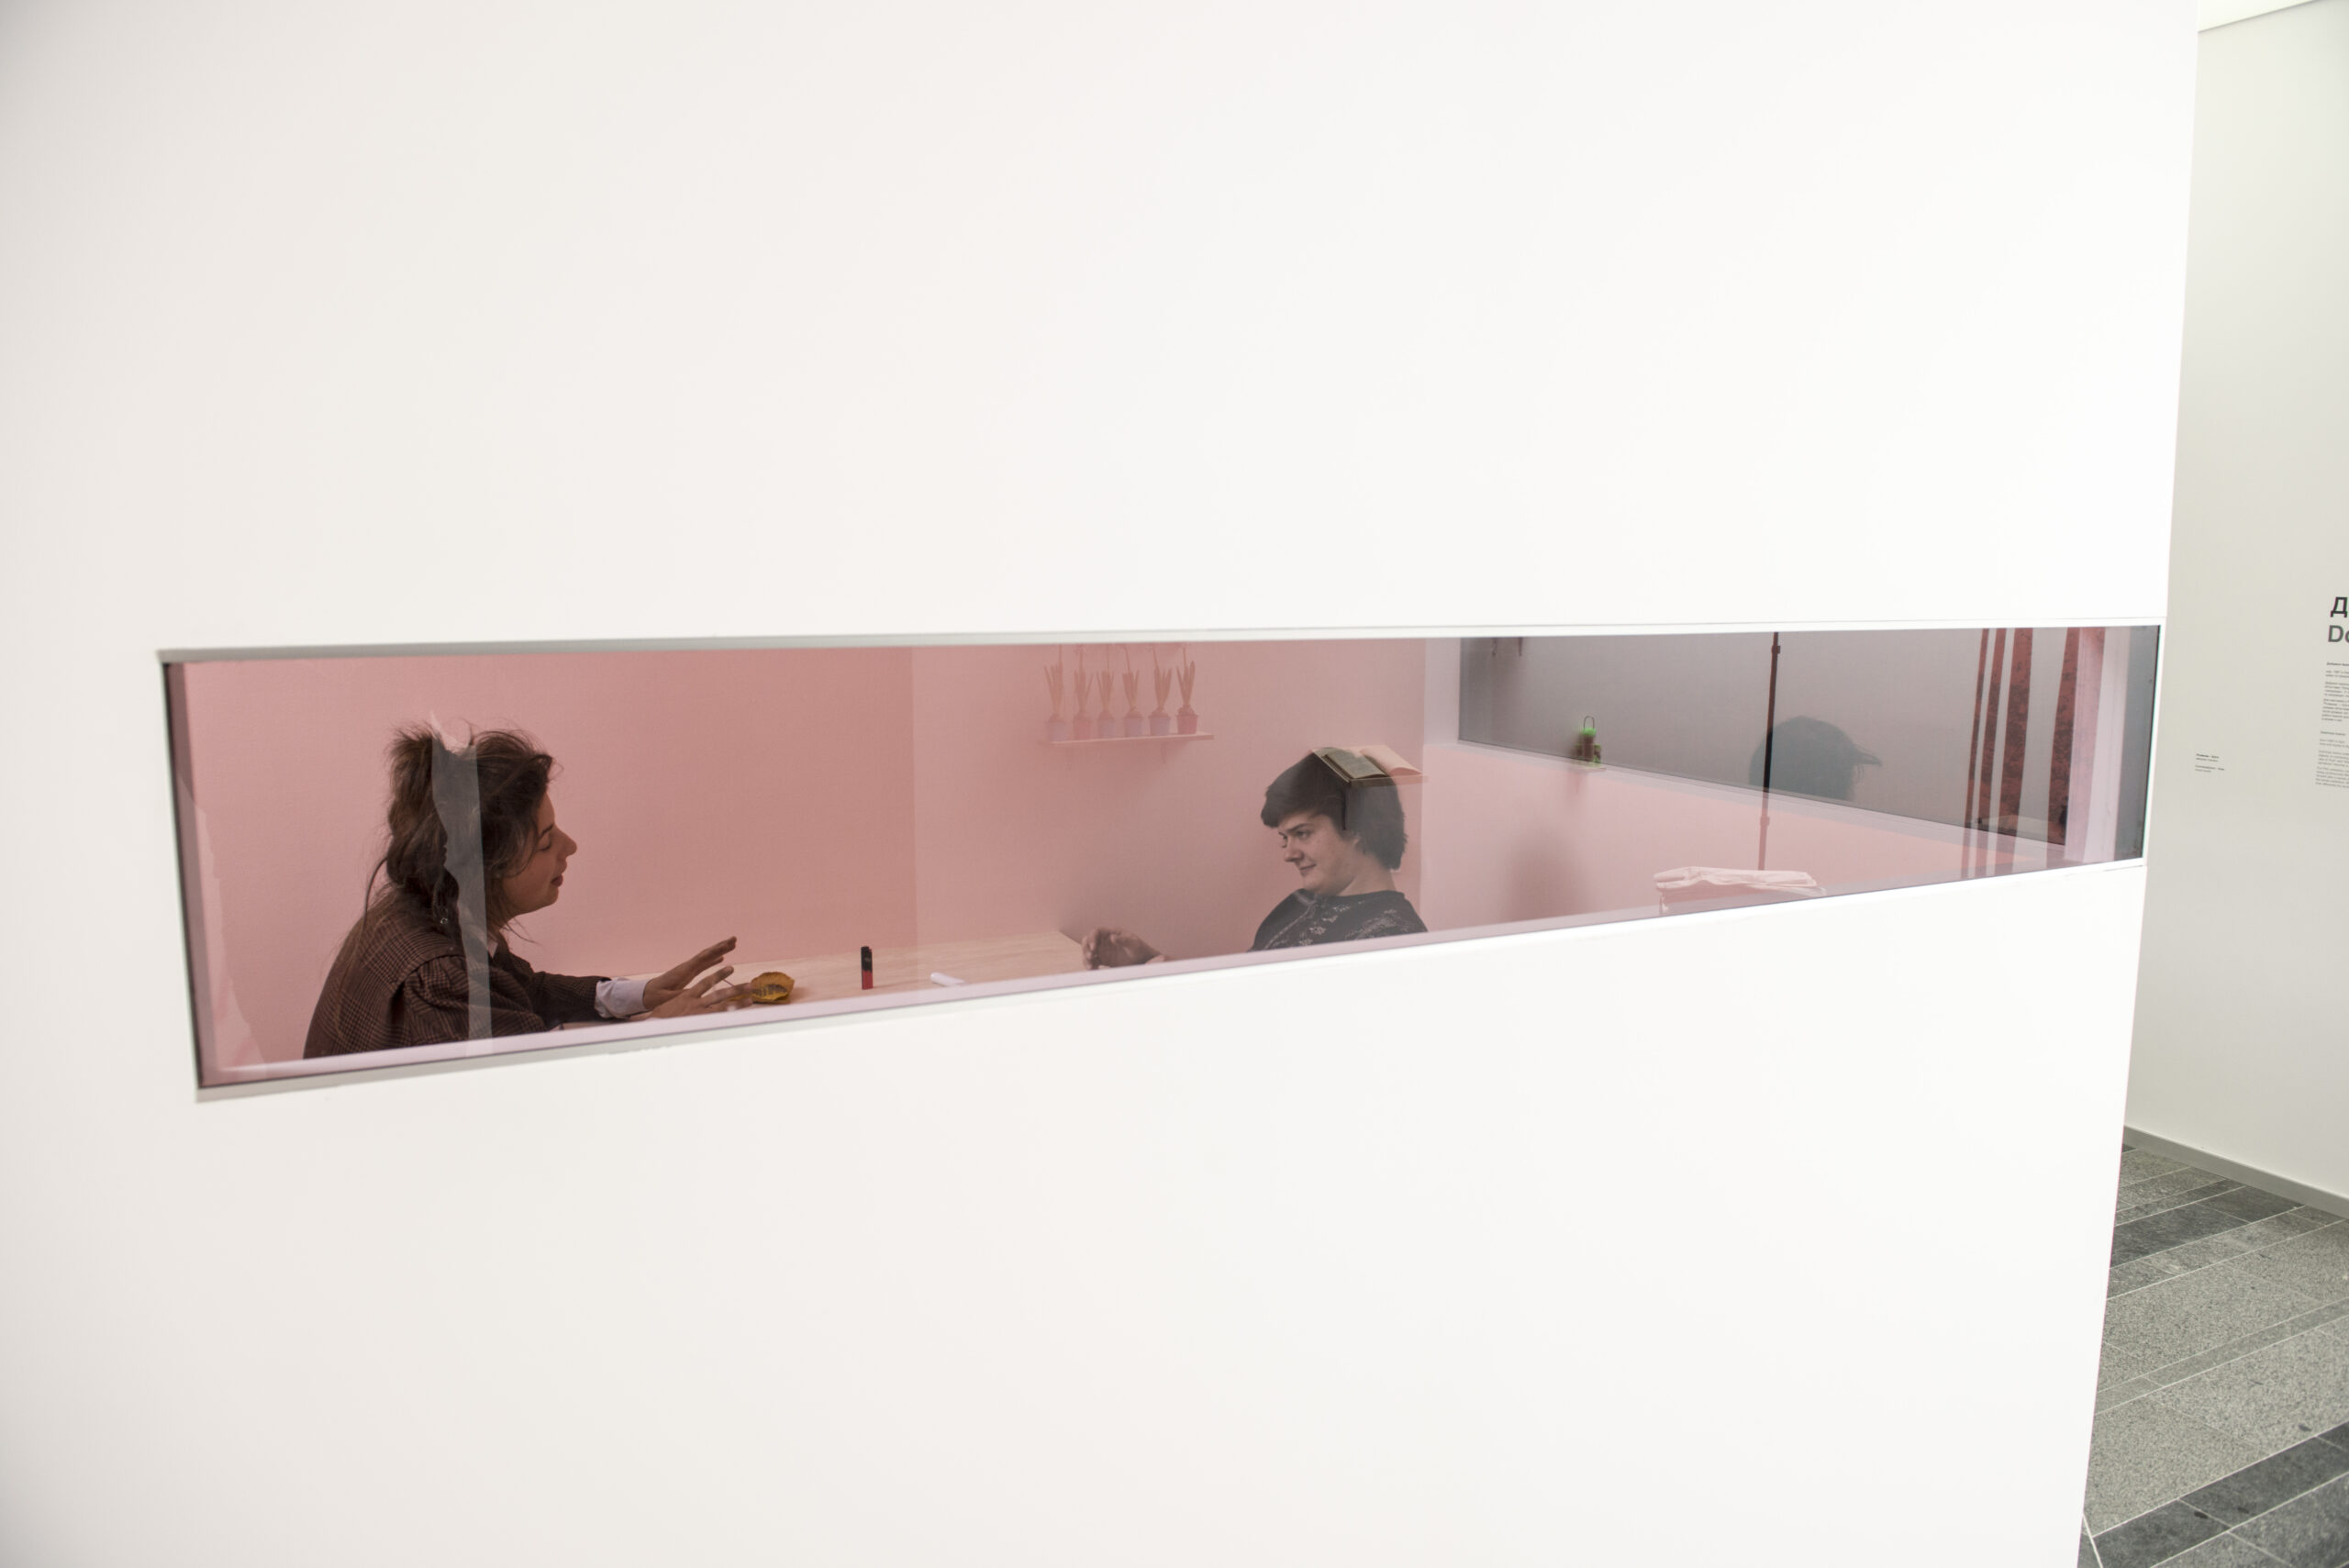 «Розмови. Катя», 2013. Фото надане PinchukArtCentre